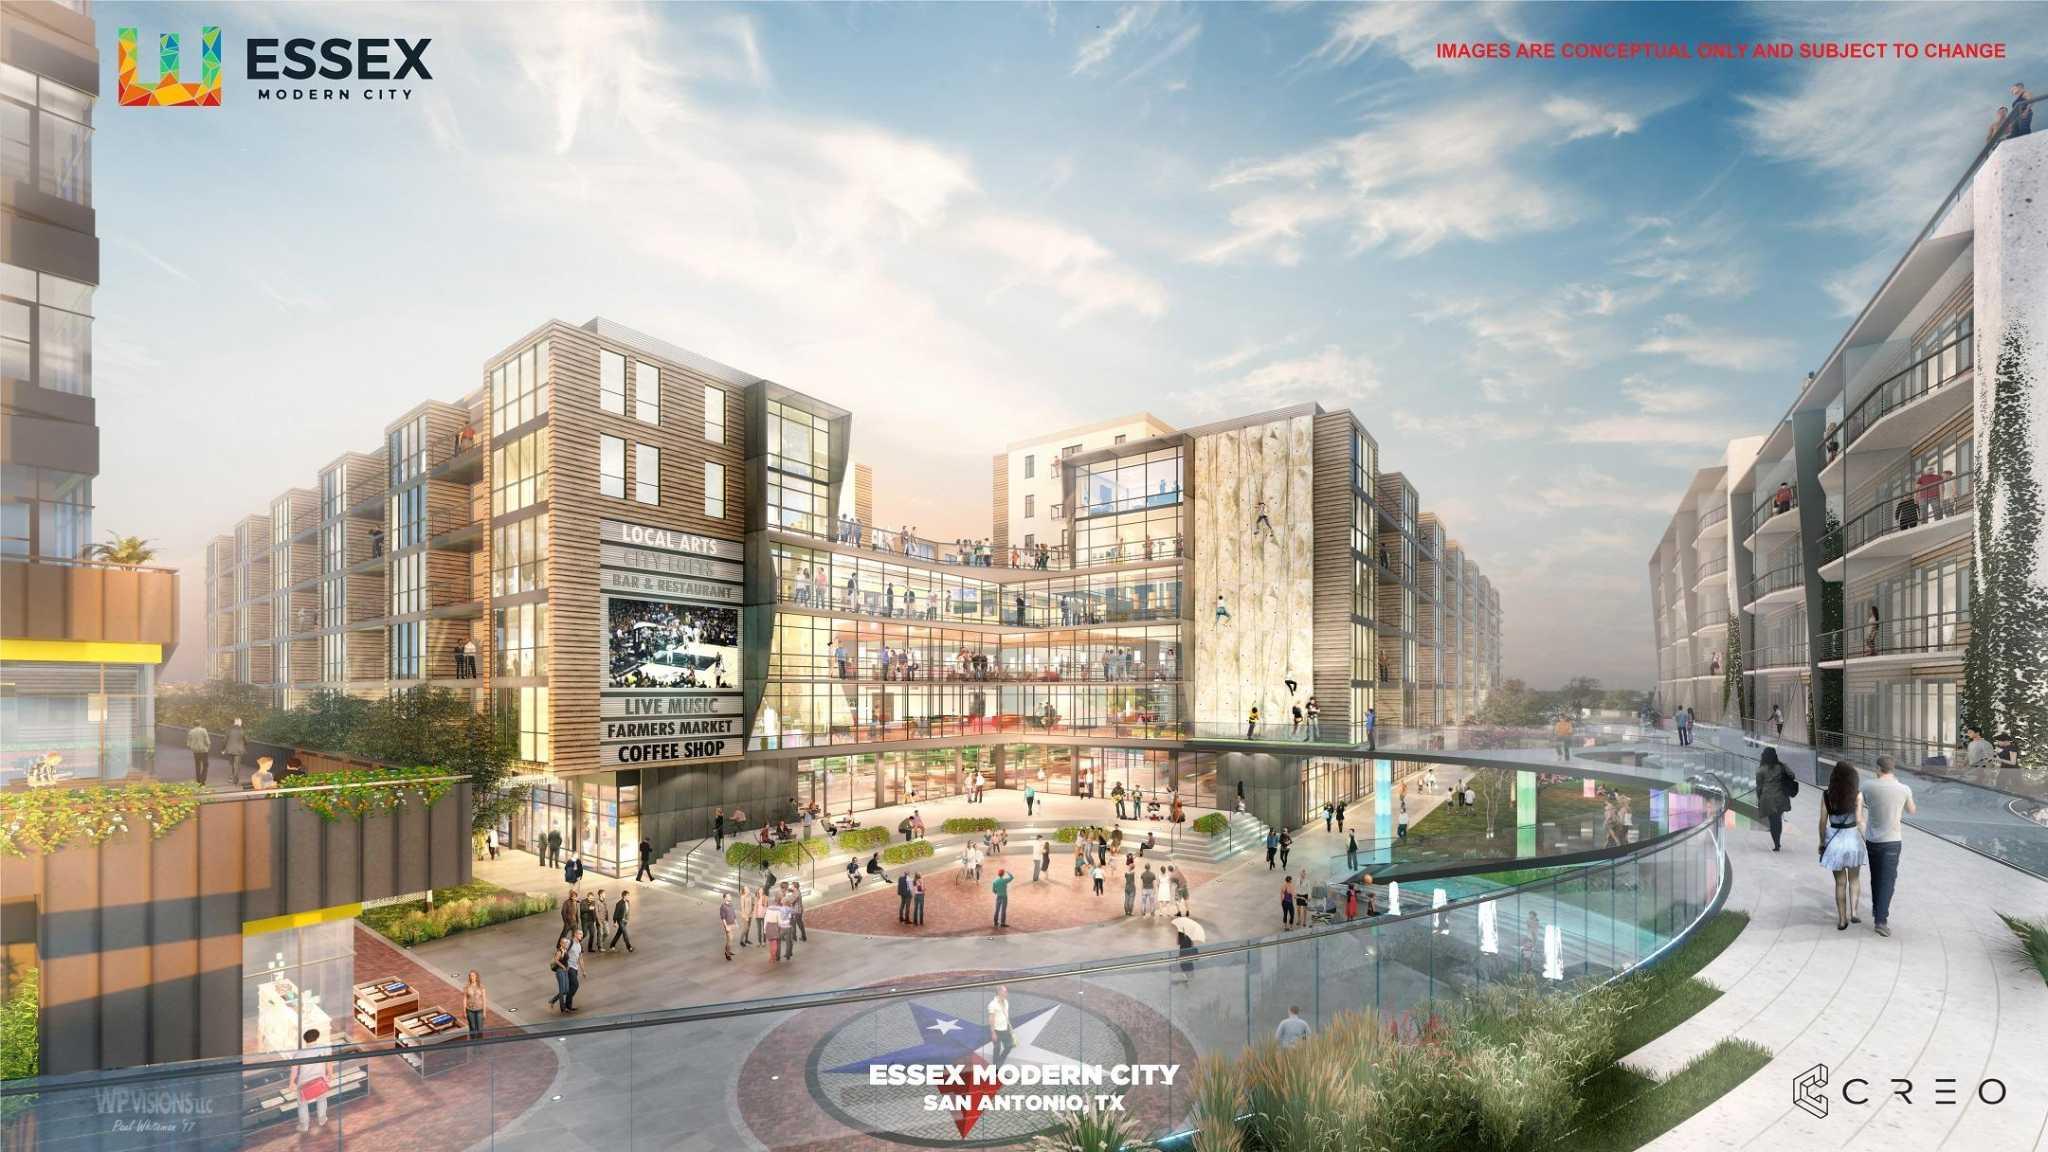 East Side To Receive 150 Million Pearl Like Development